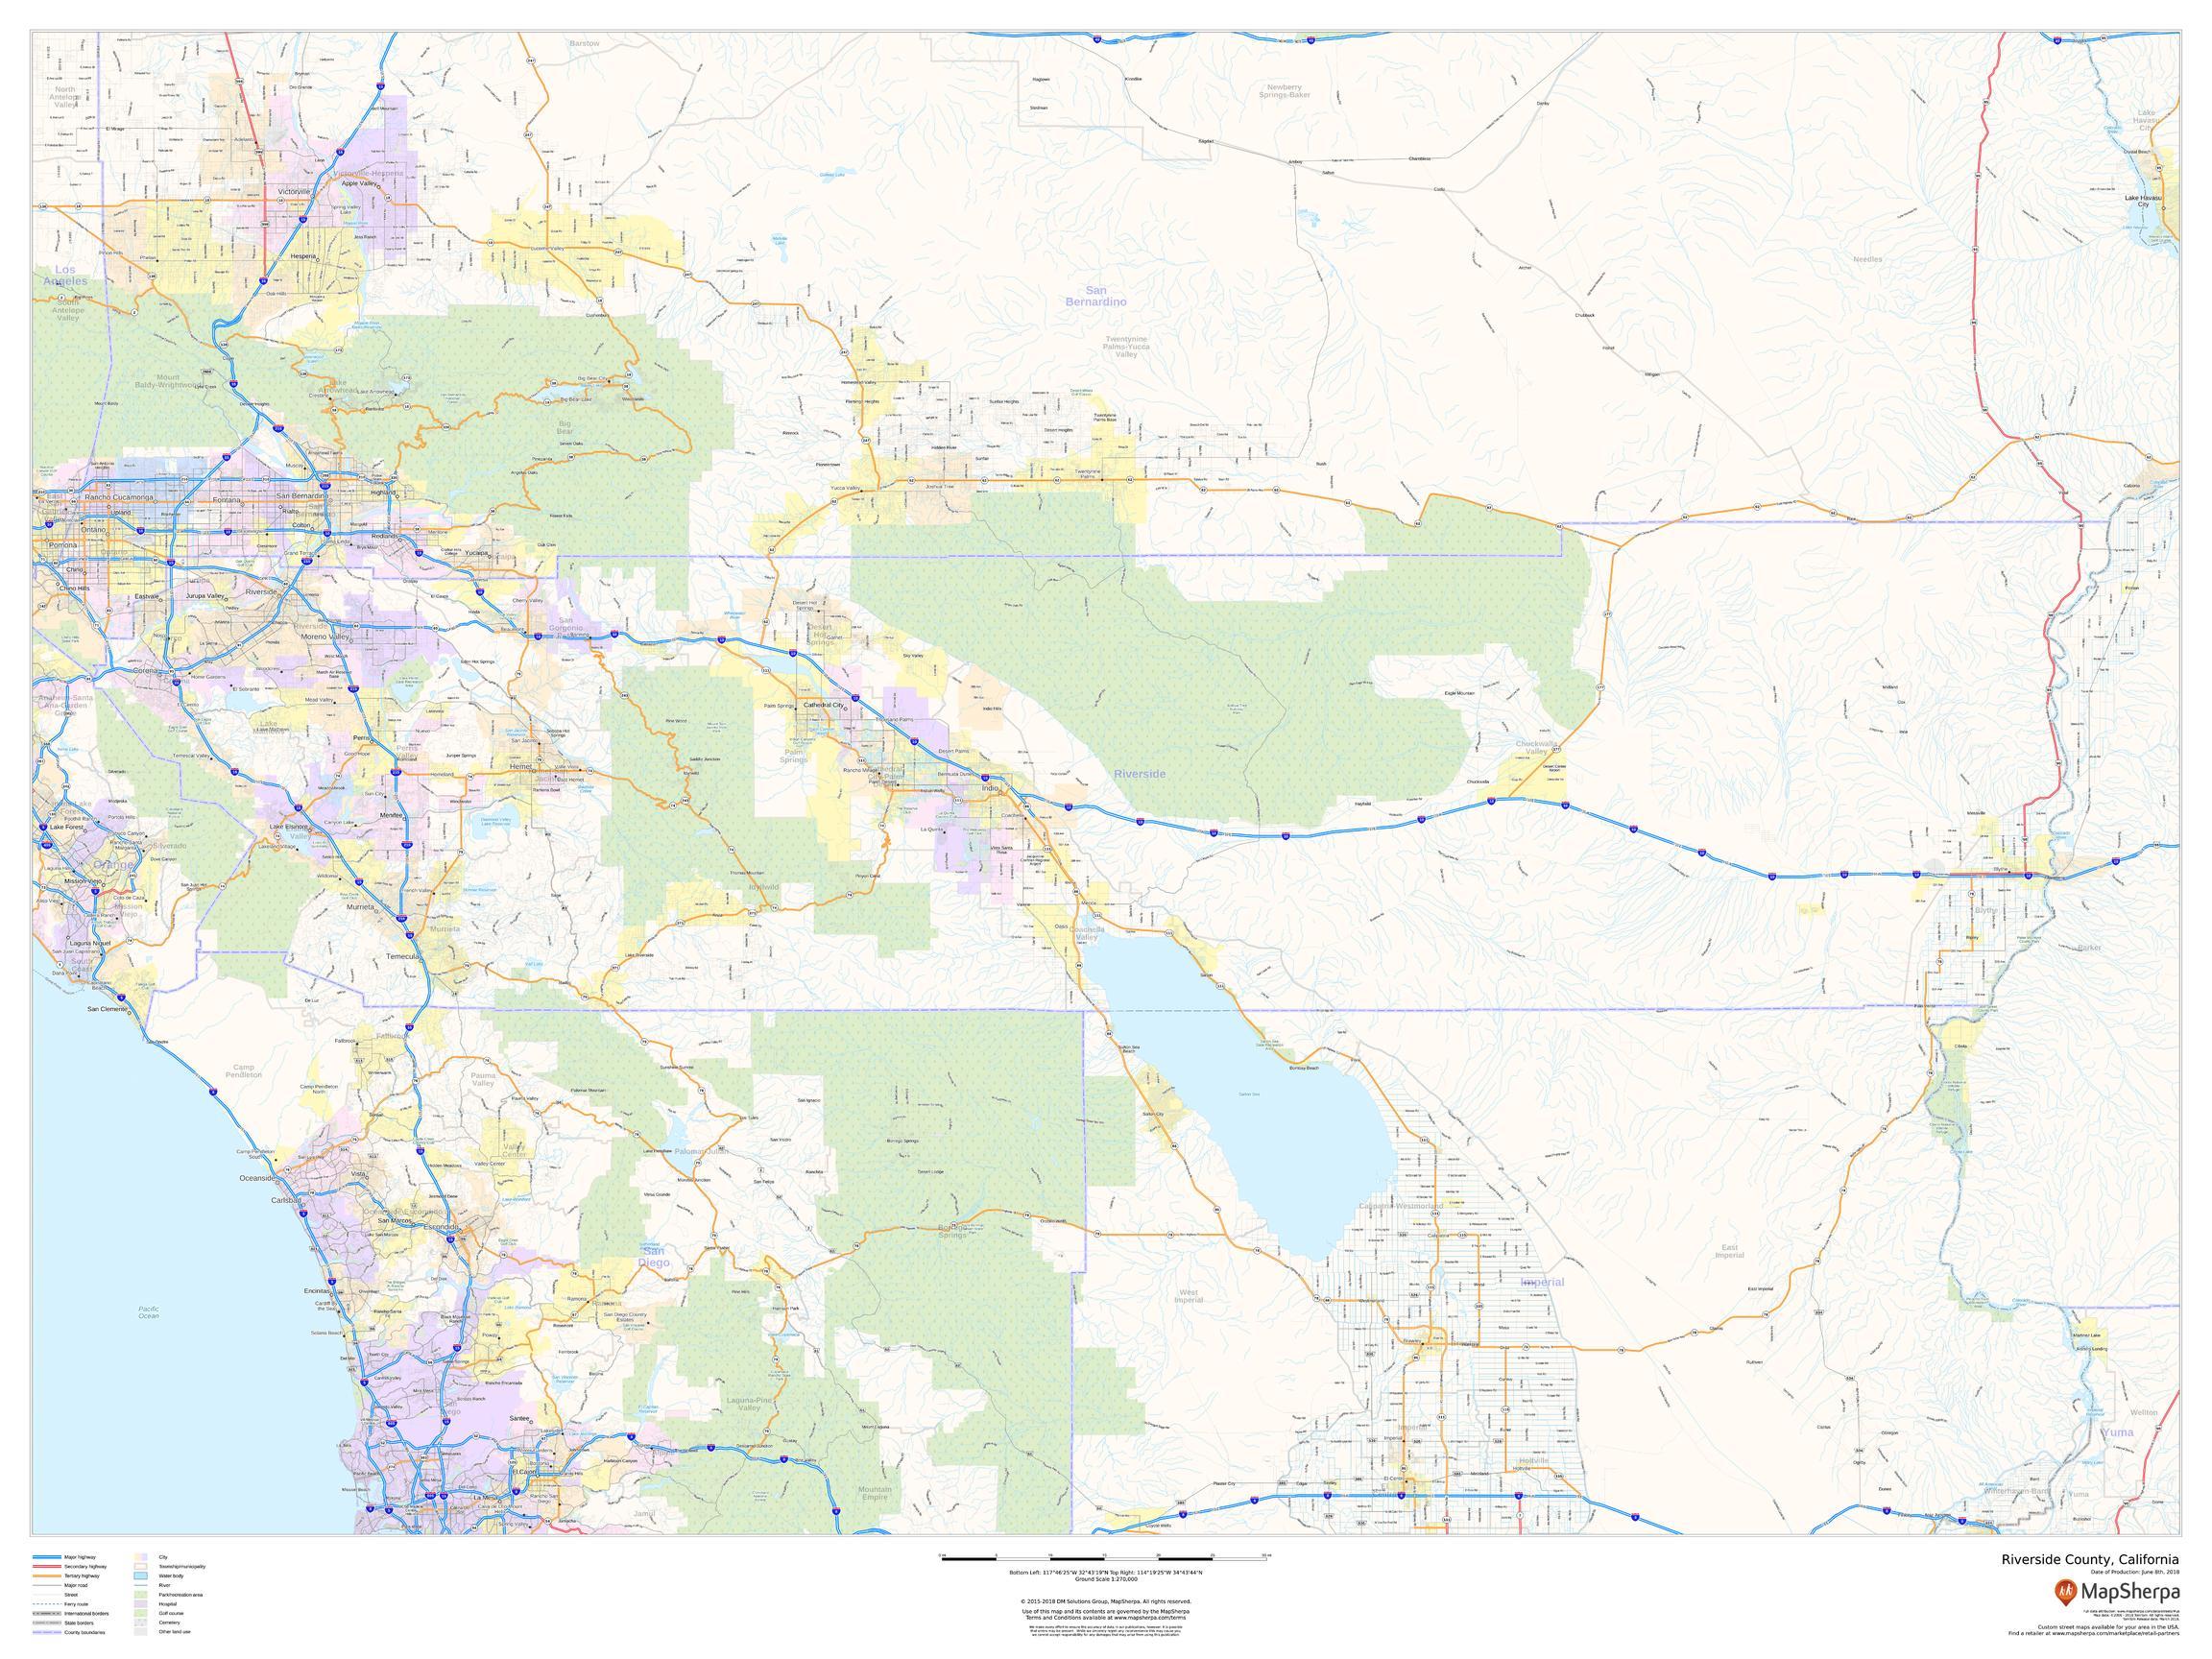 Riverside County Map (California)